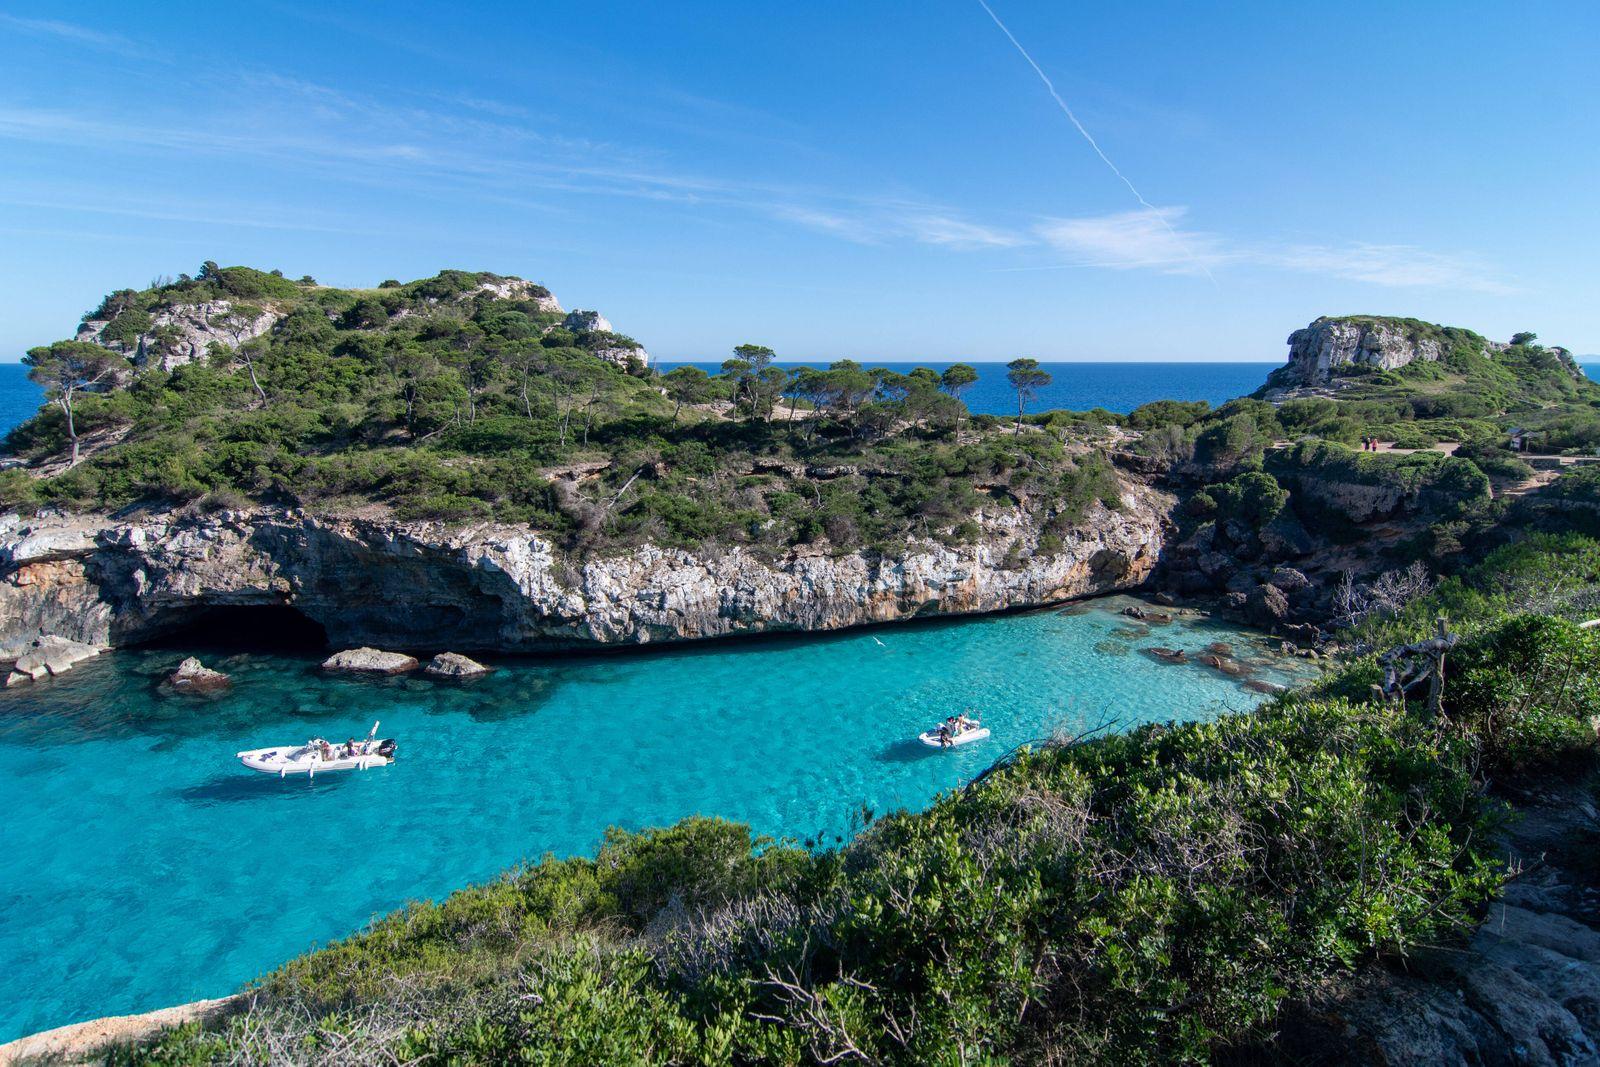 20200523 Mallorca during Corona Lock down PALMA DE MALLORCA, SPAIN - MAY 23 2020 : Caló del Moro at - Mallorca during Co